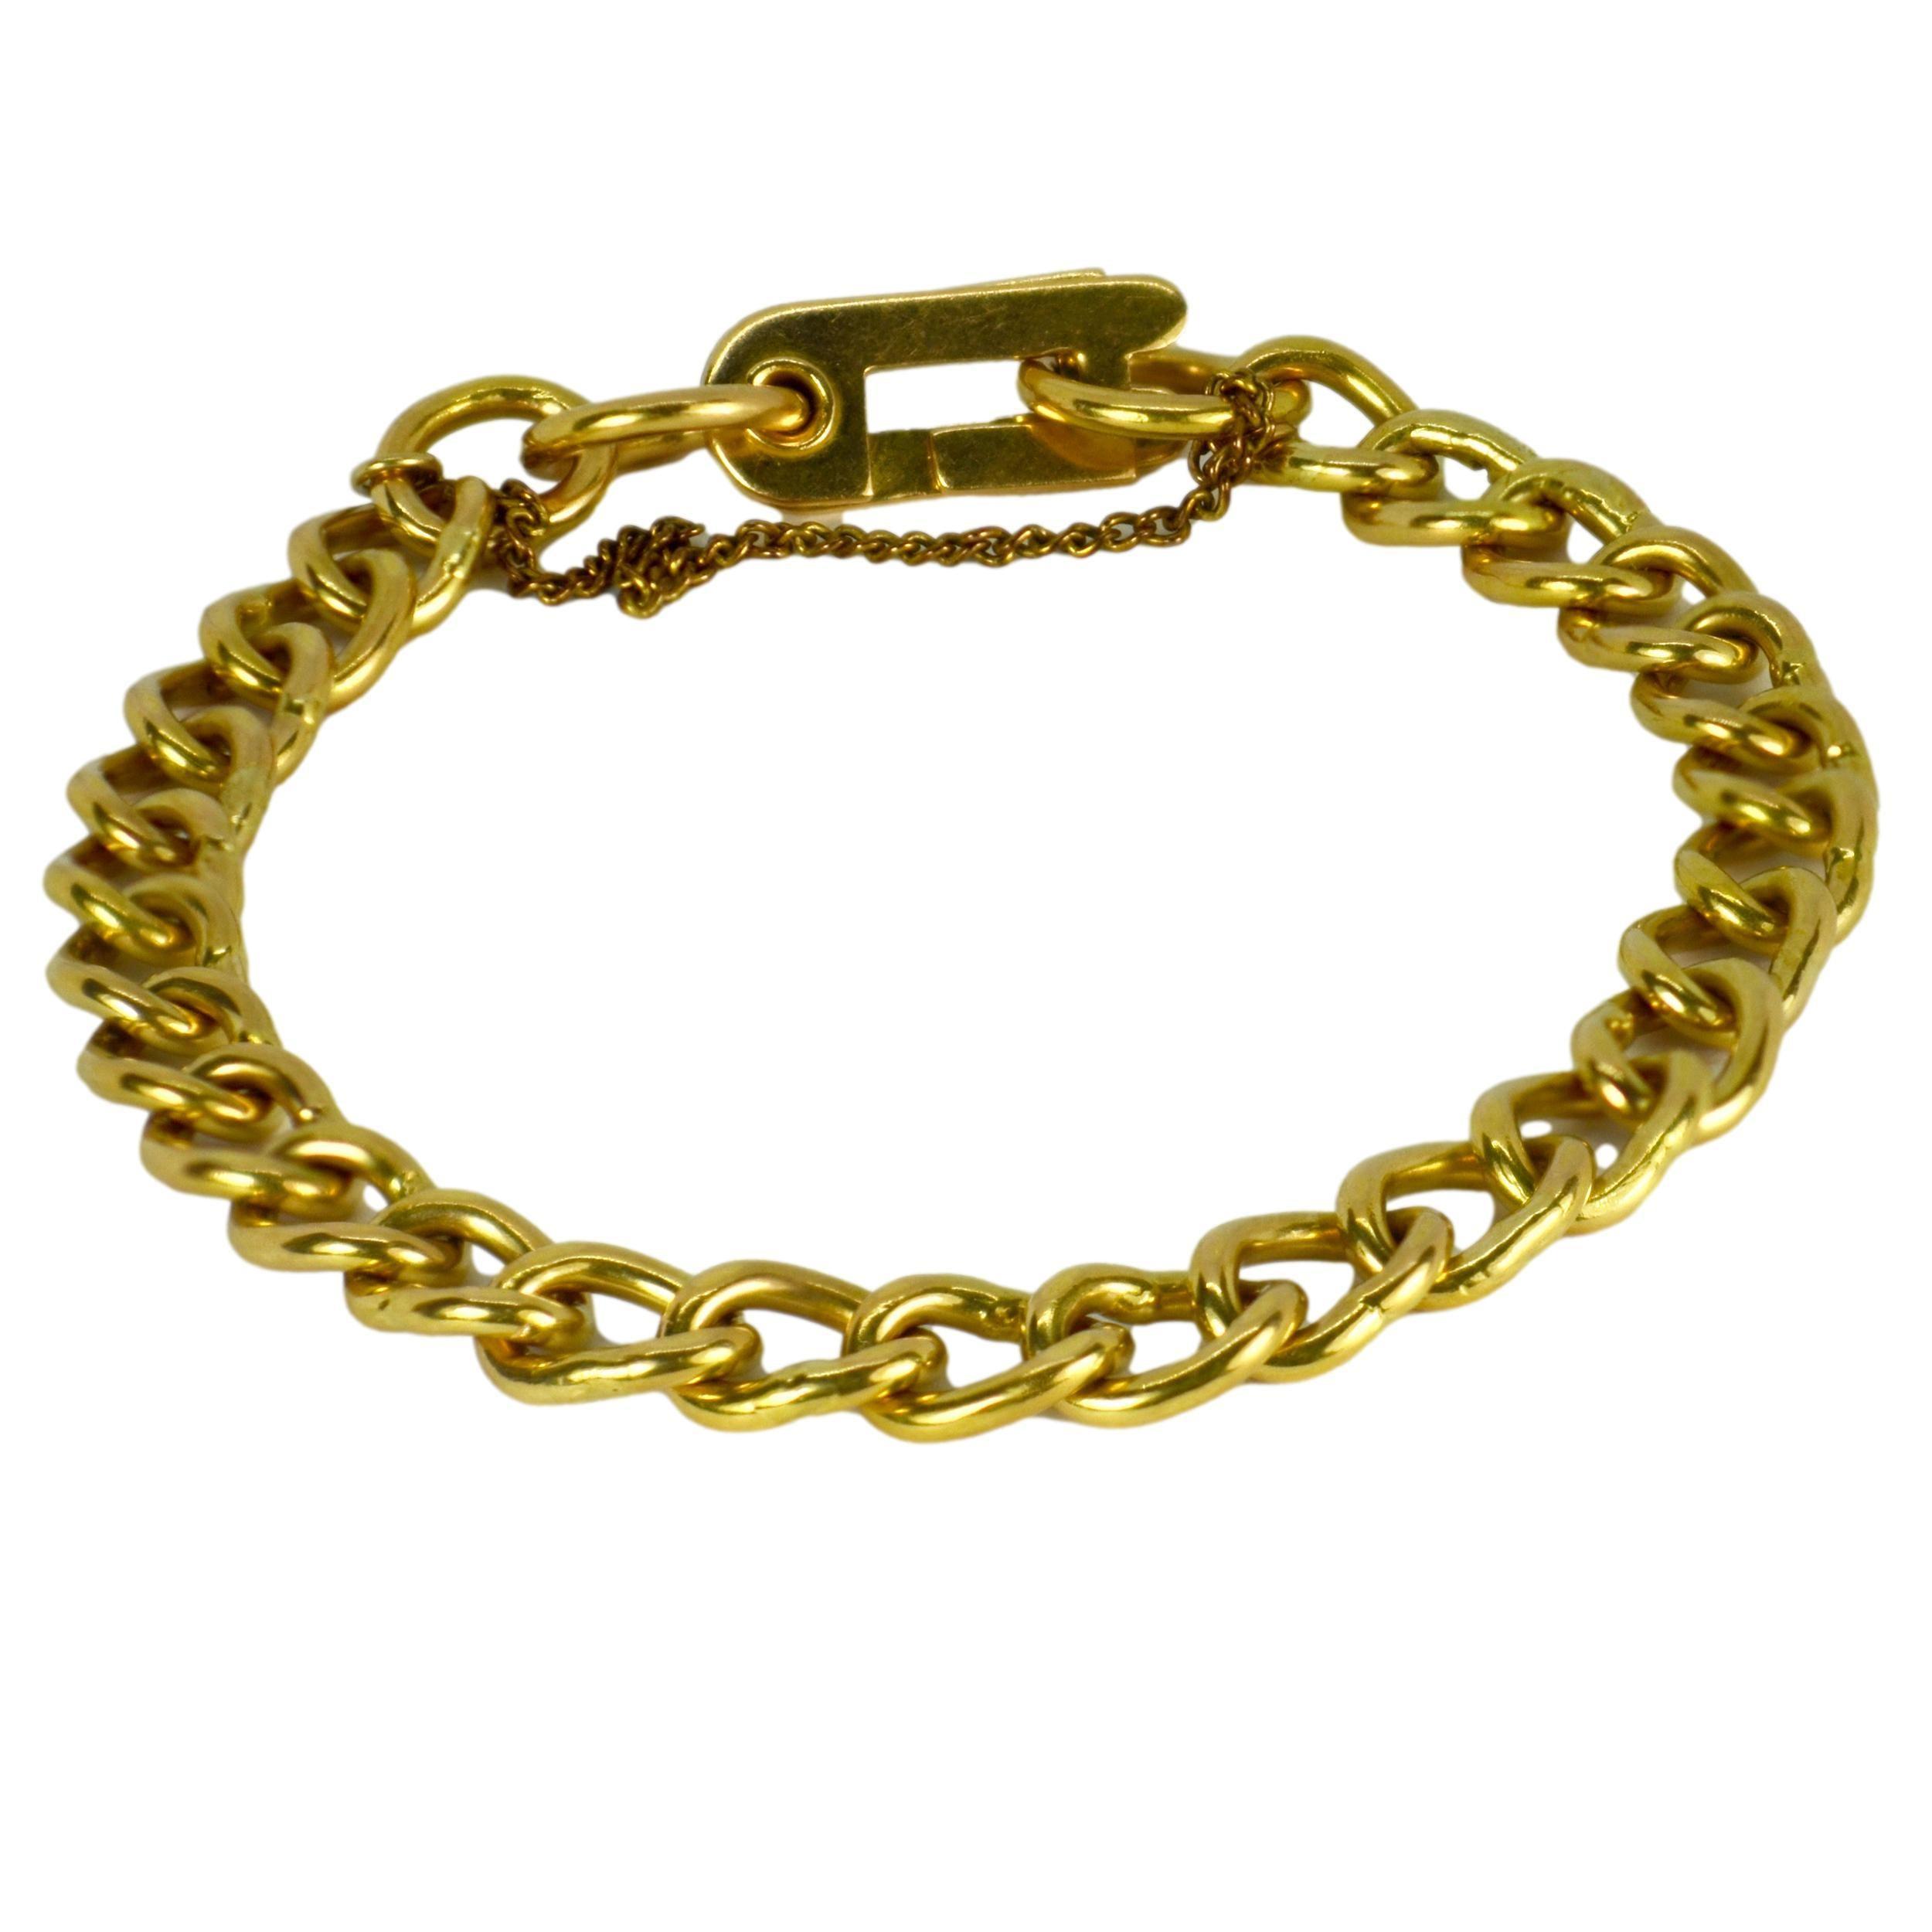 18 Karat Yellow Gold Faceted Curb Link Bracelet